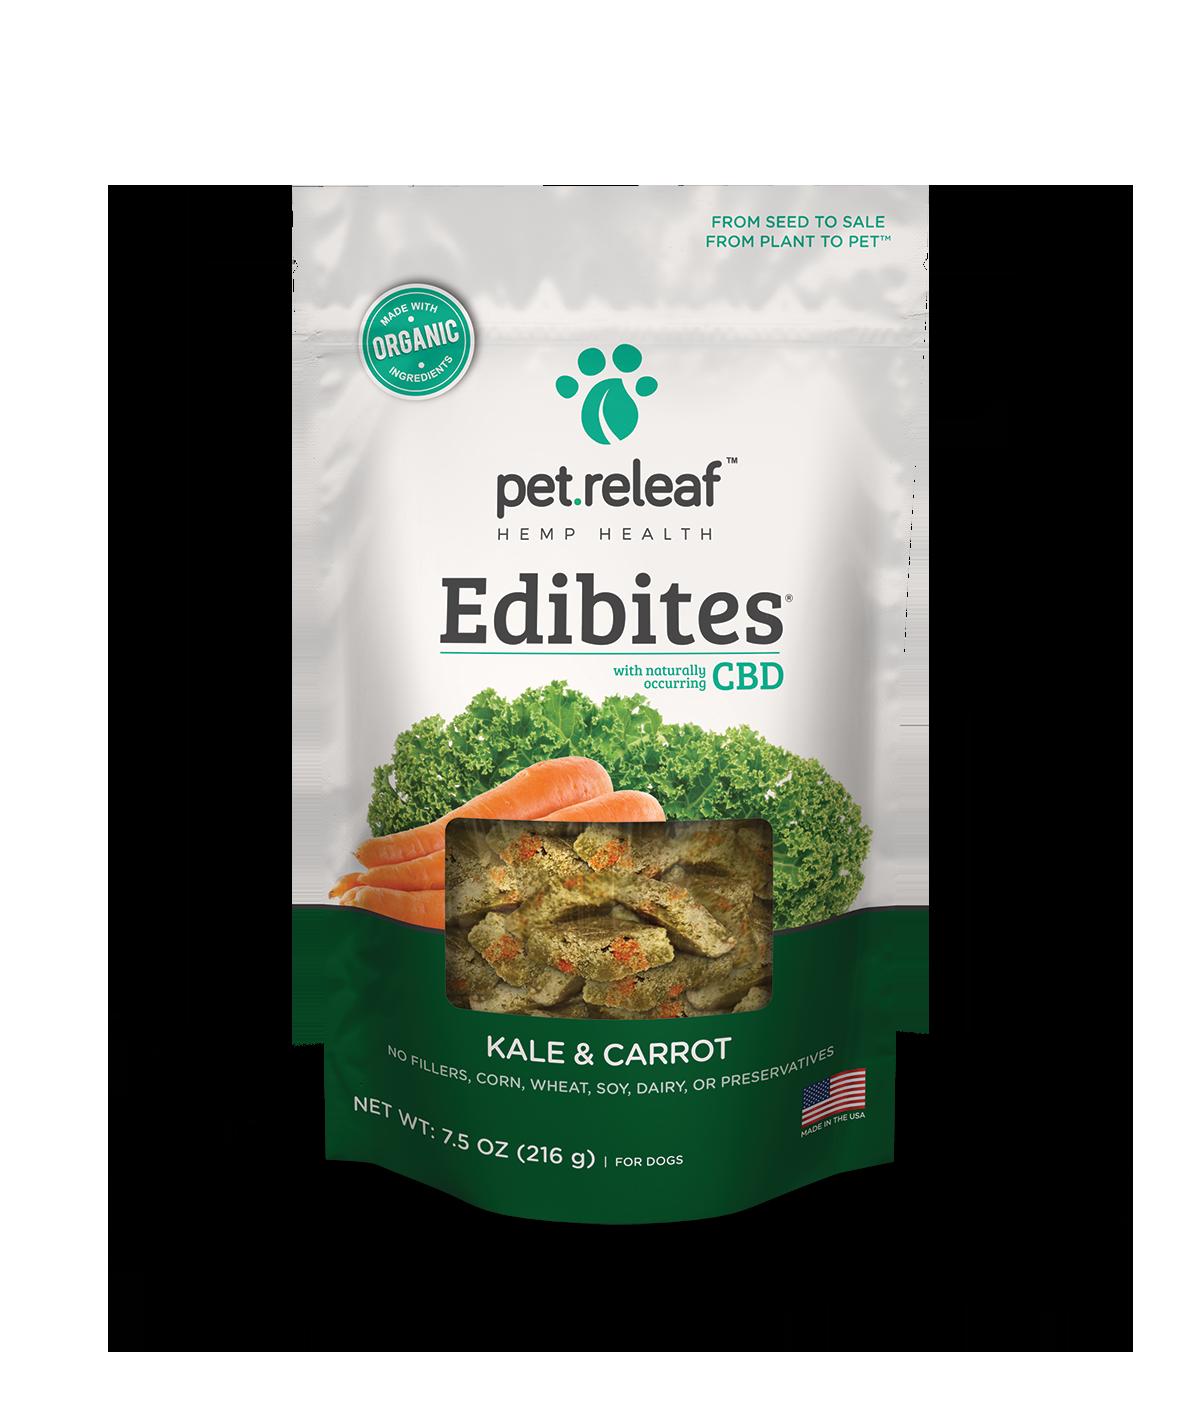 Pet Releaf 'Edibites' Kale and Carrot Alternative Supplement Oil Dog Treat, 7.5-oz bag